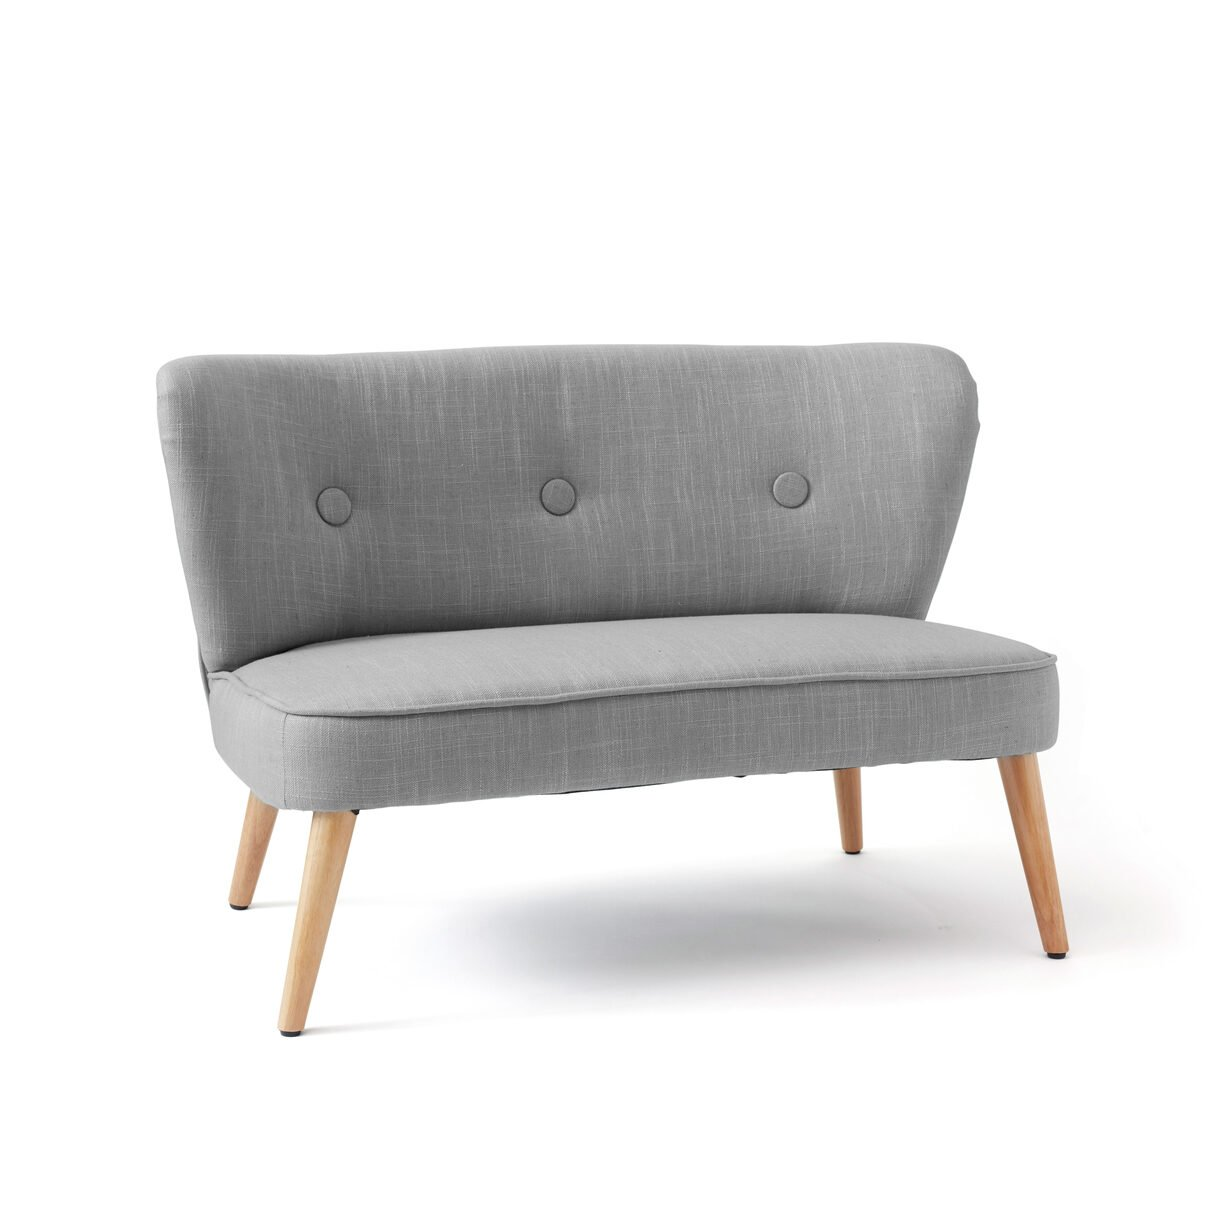 Kids Concept - Kids Sofa, Dark grey (1000576)